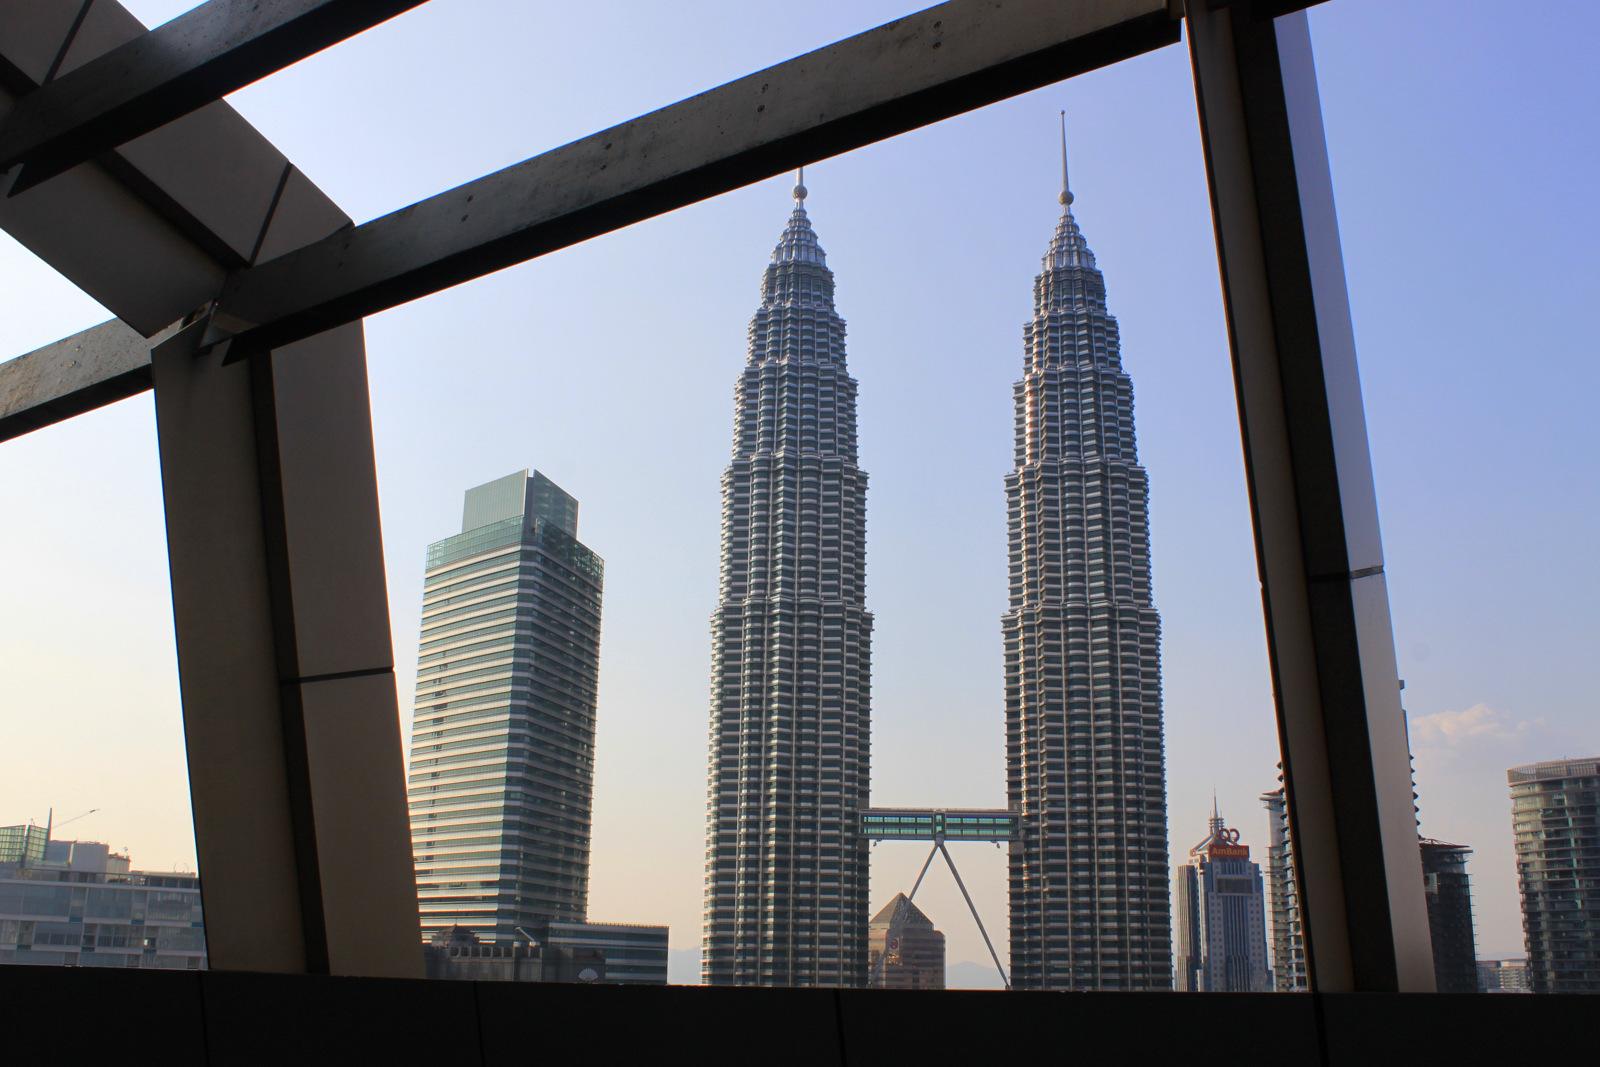 Tours Petronas depuis le SkyBar